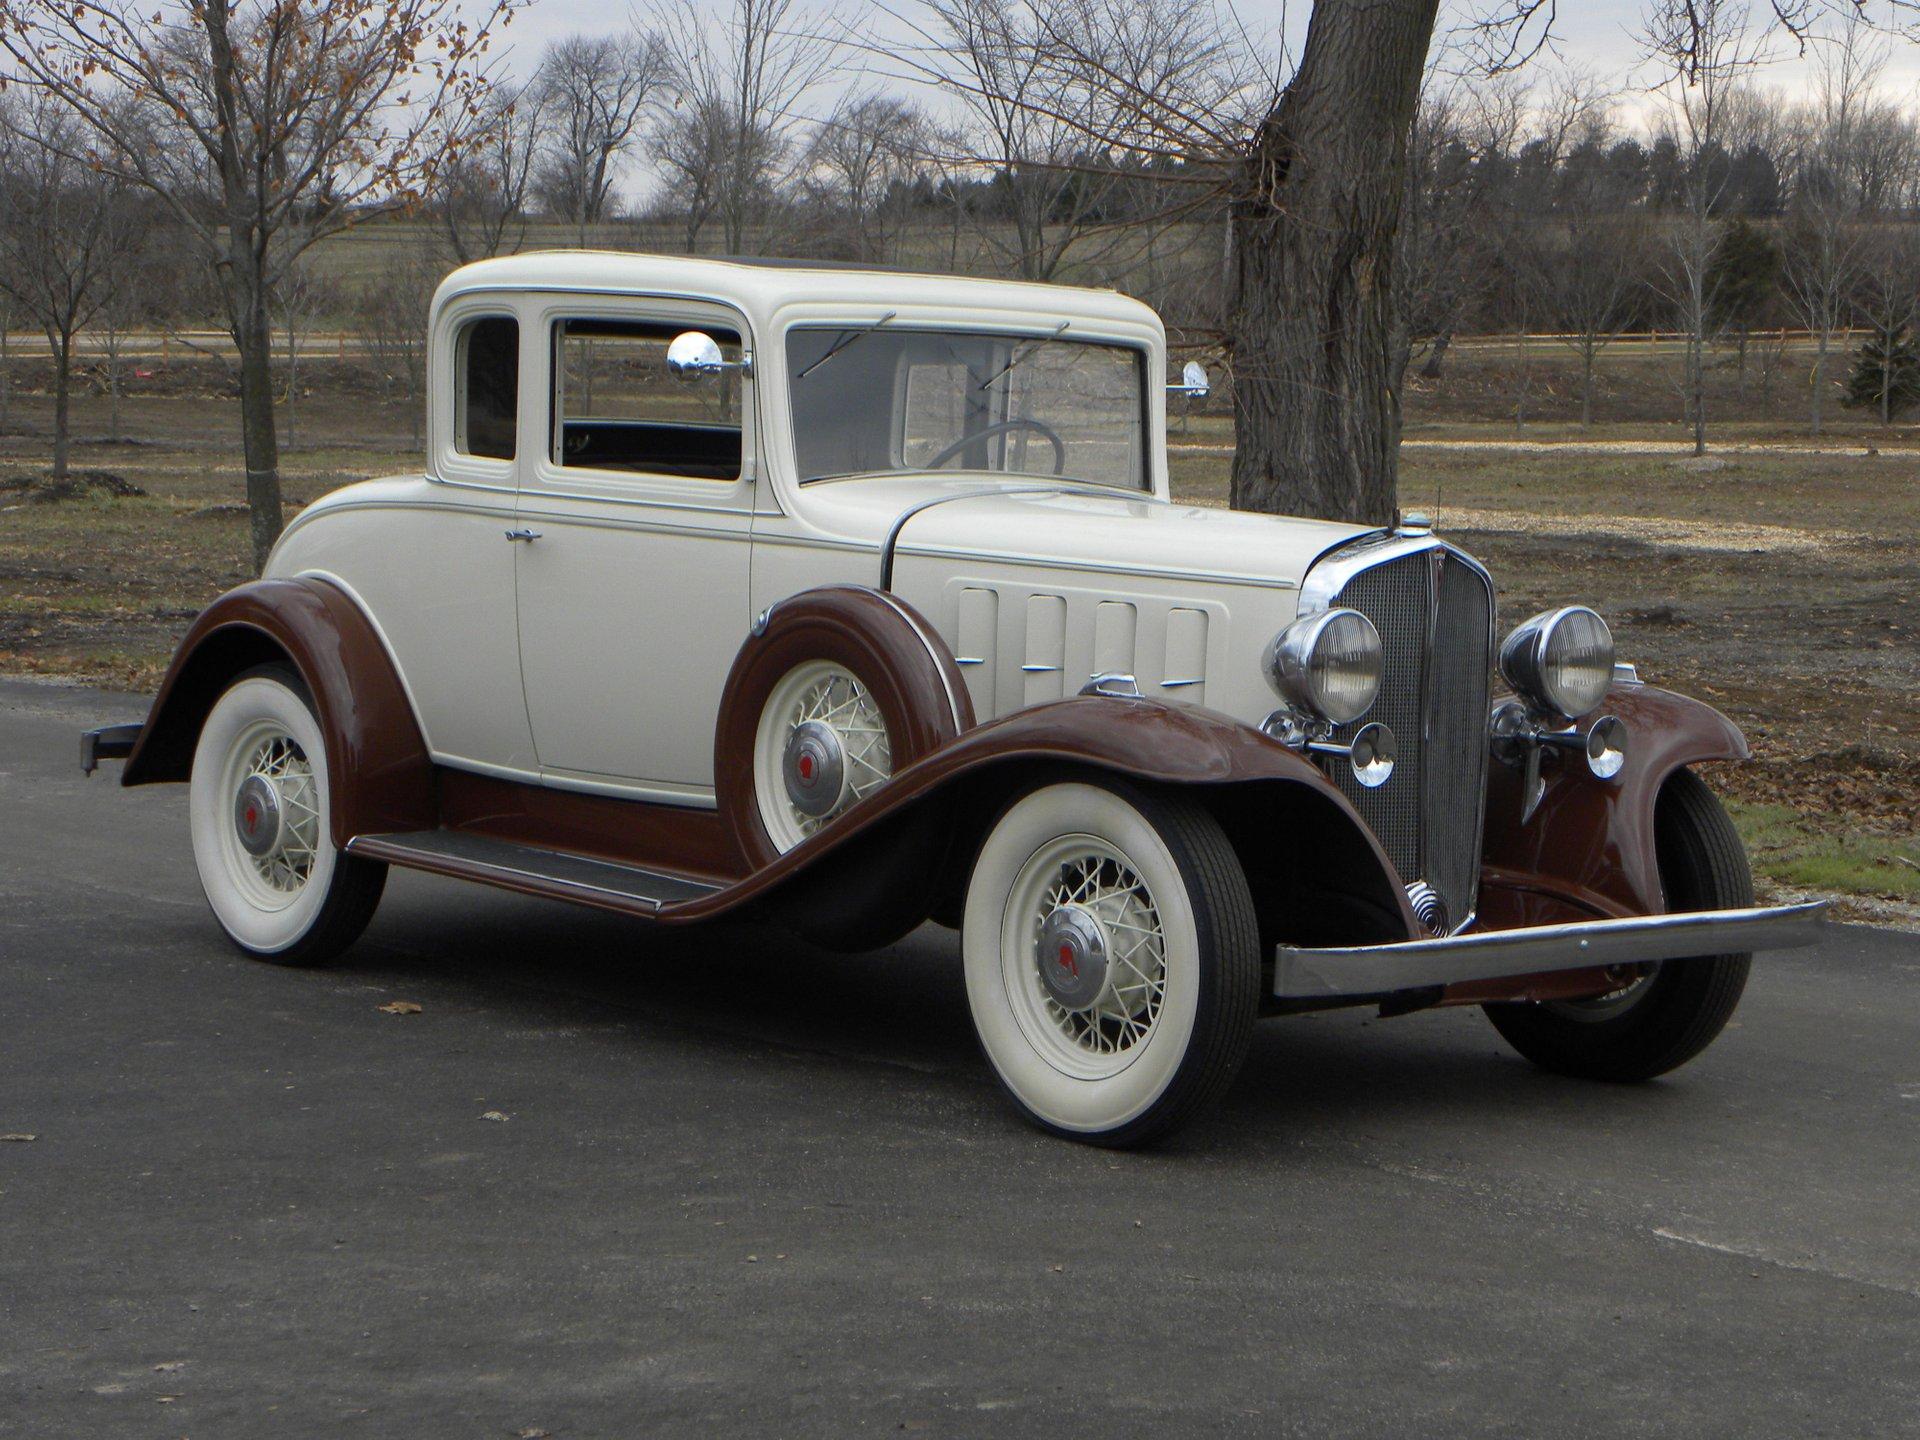 1932 pontiac series 302 coupe